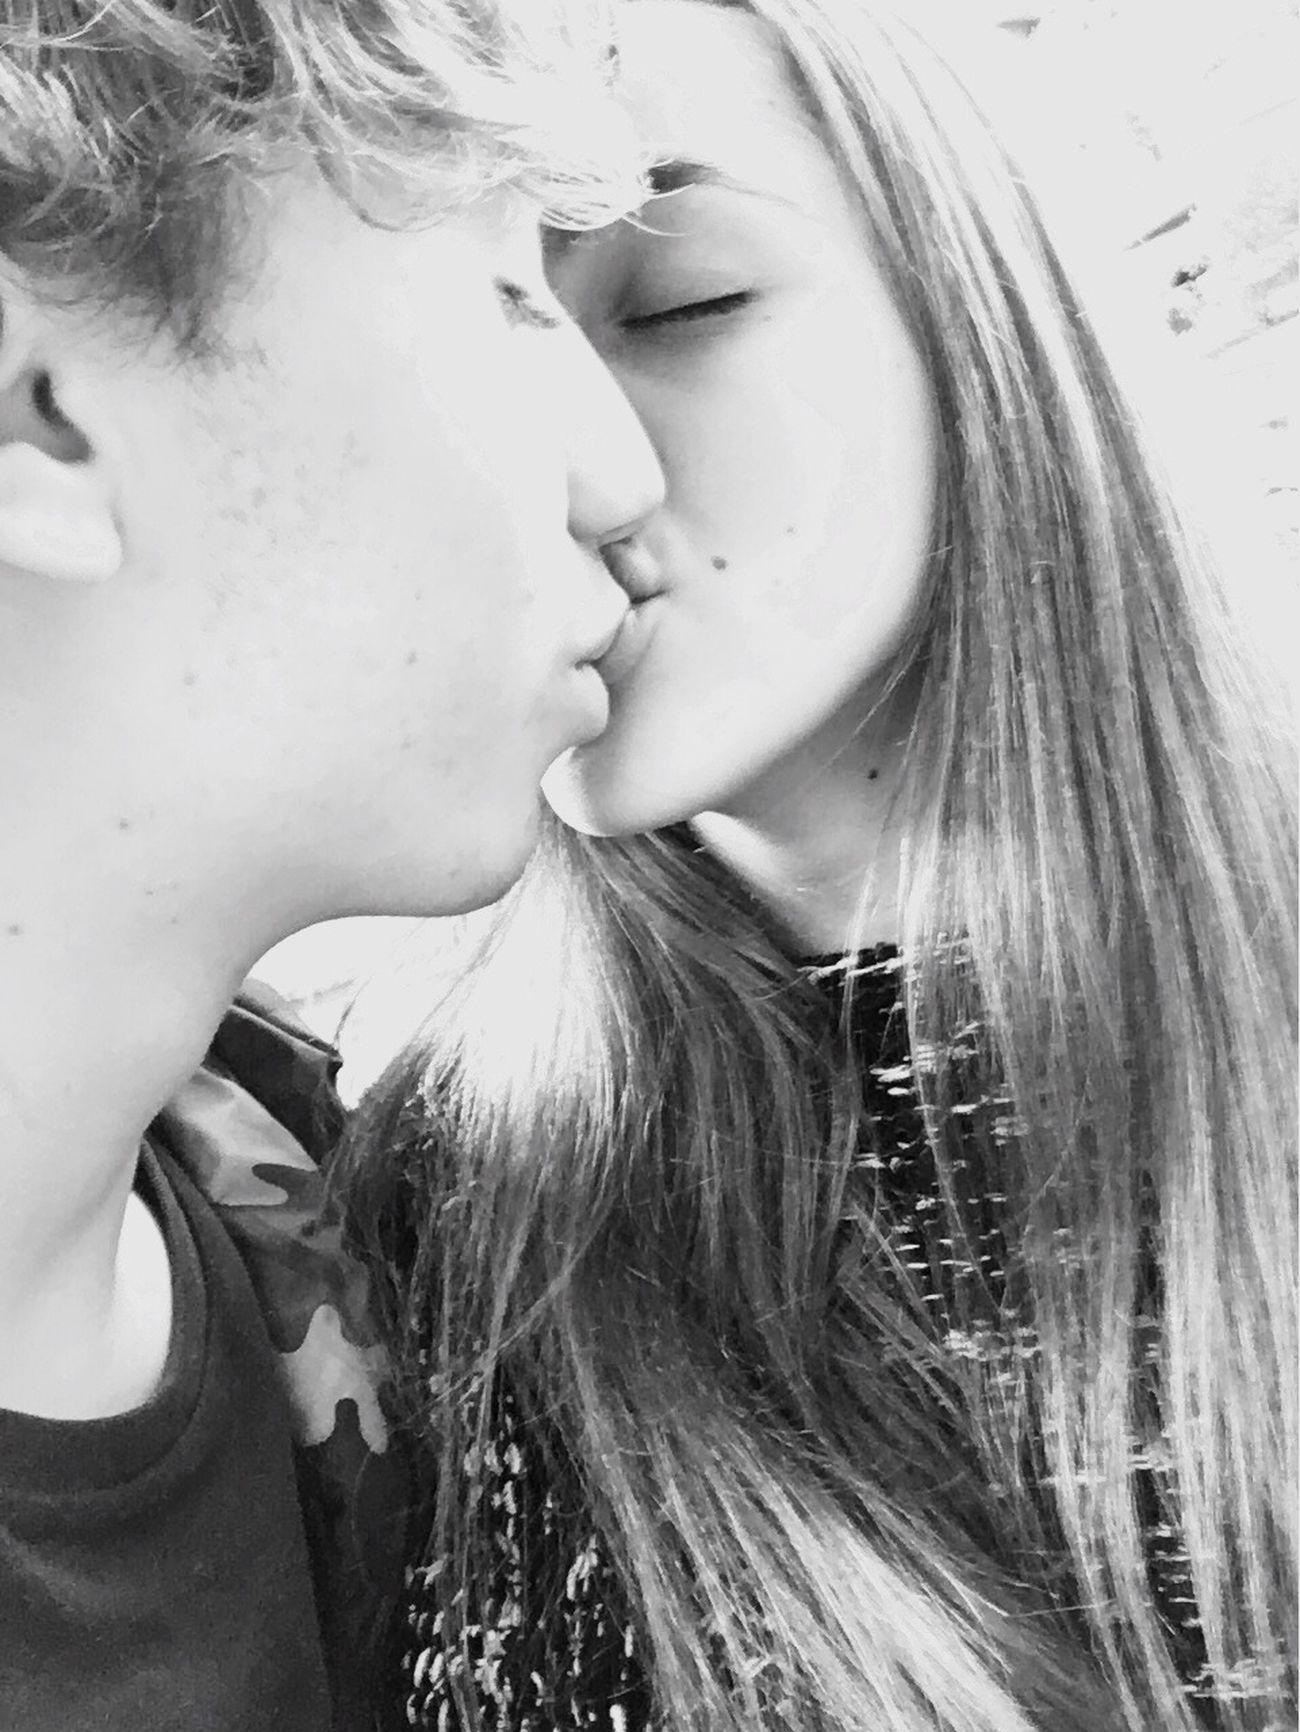 Di amarti non mi stancherò mai 💙 Per Sempre  Ti Amo